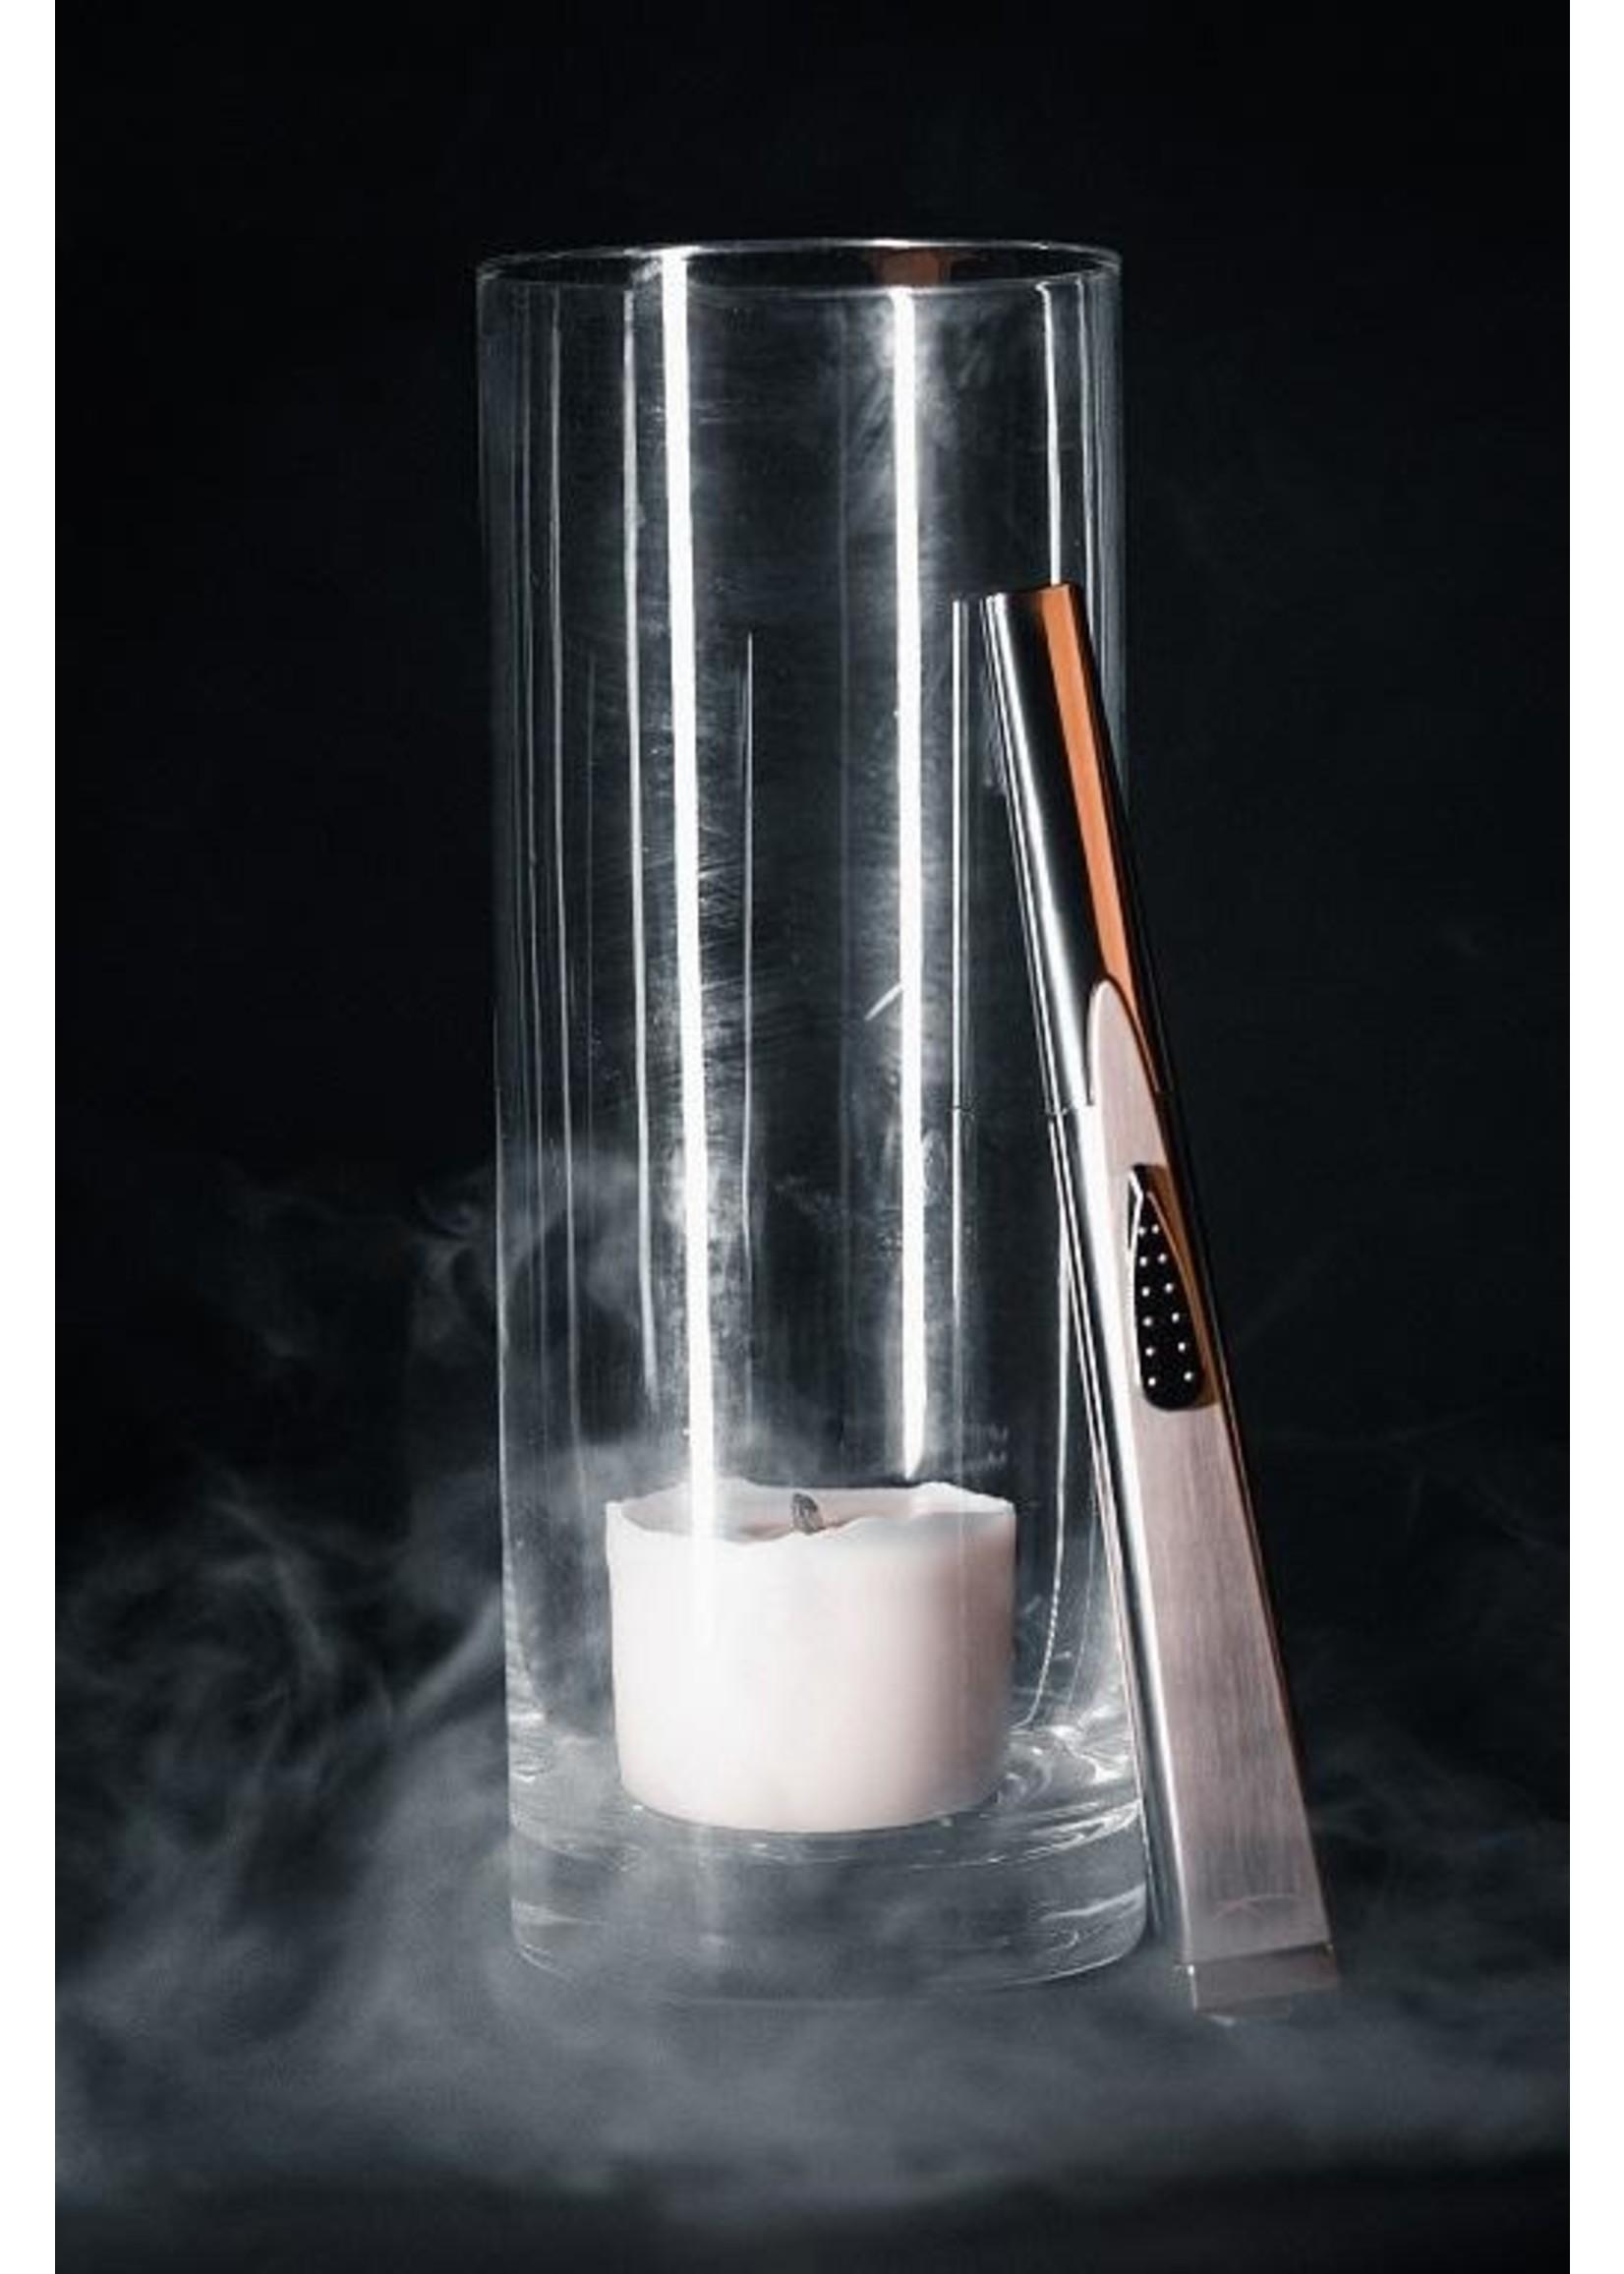 The Sleek Lighter